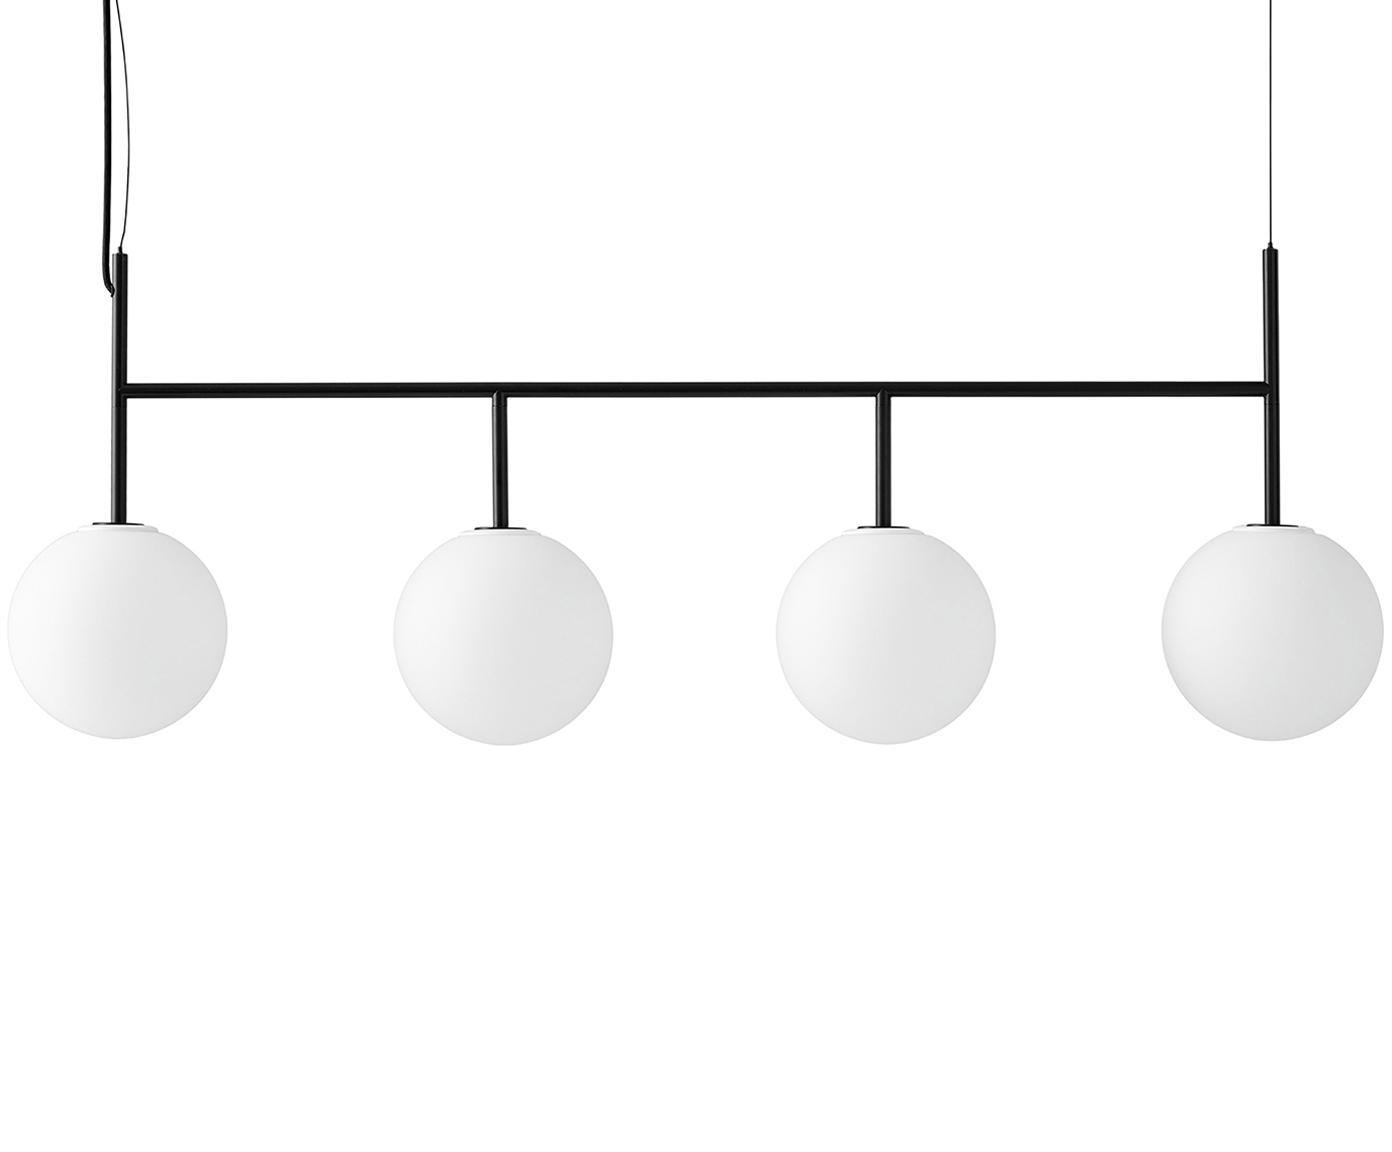 Lampada a sospensione a LED TR Bulb, Paralume: vetro opale, Bianco, nero, Larg. 125 x Alt. 45 cm